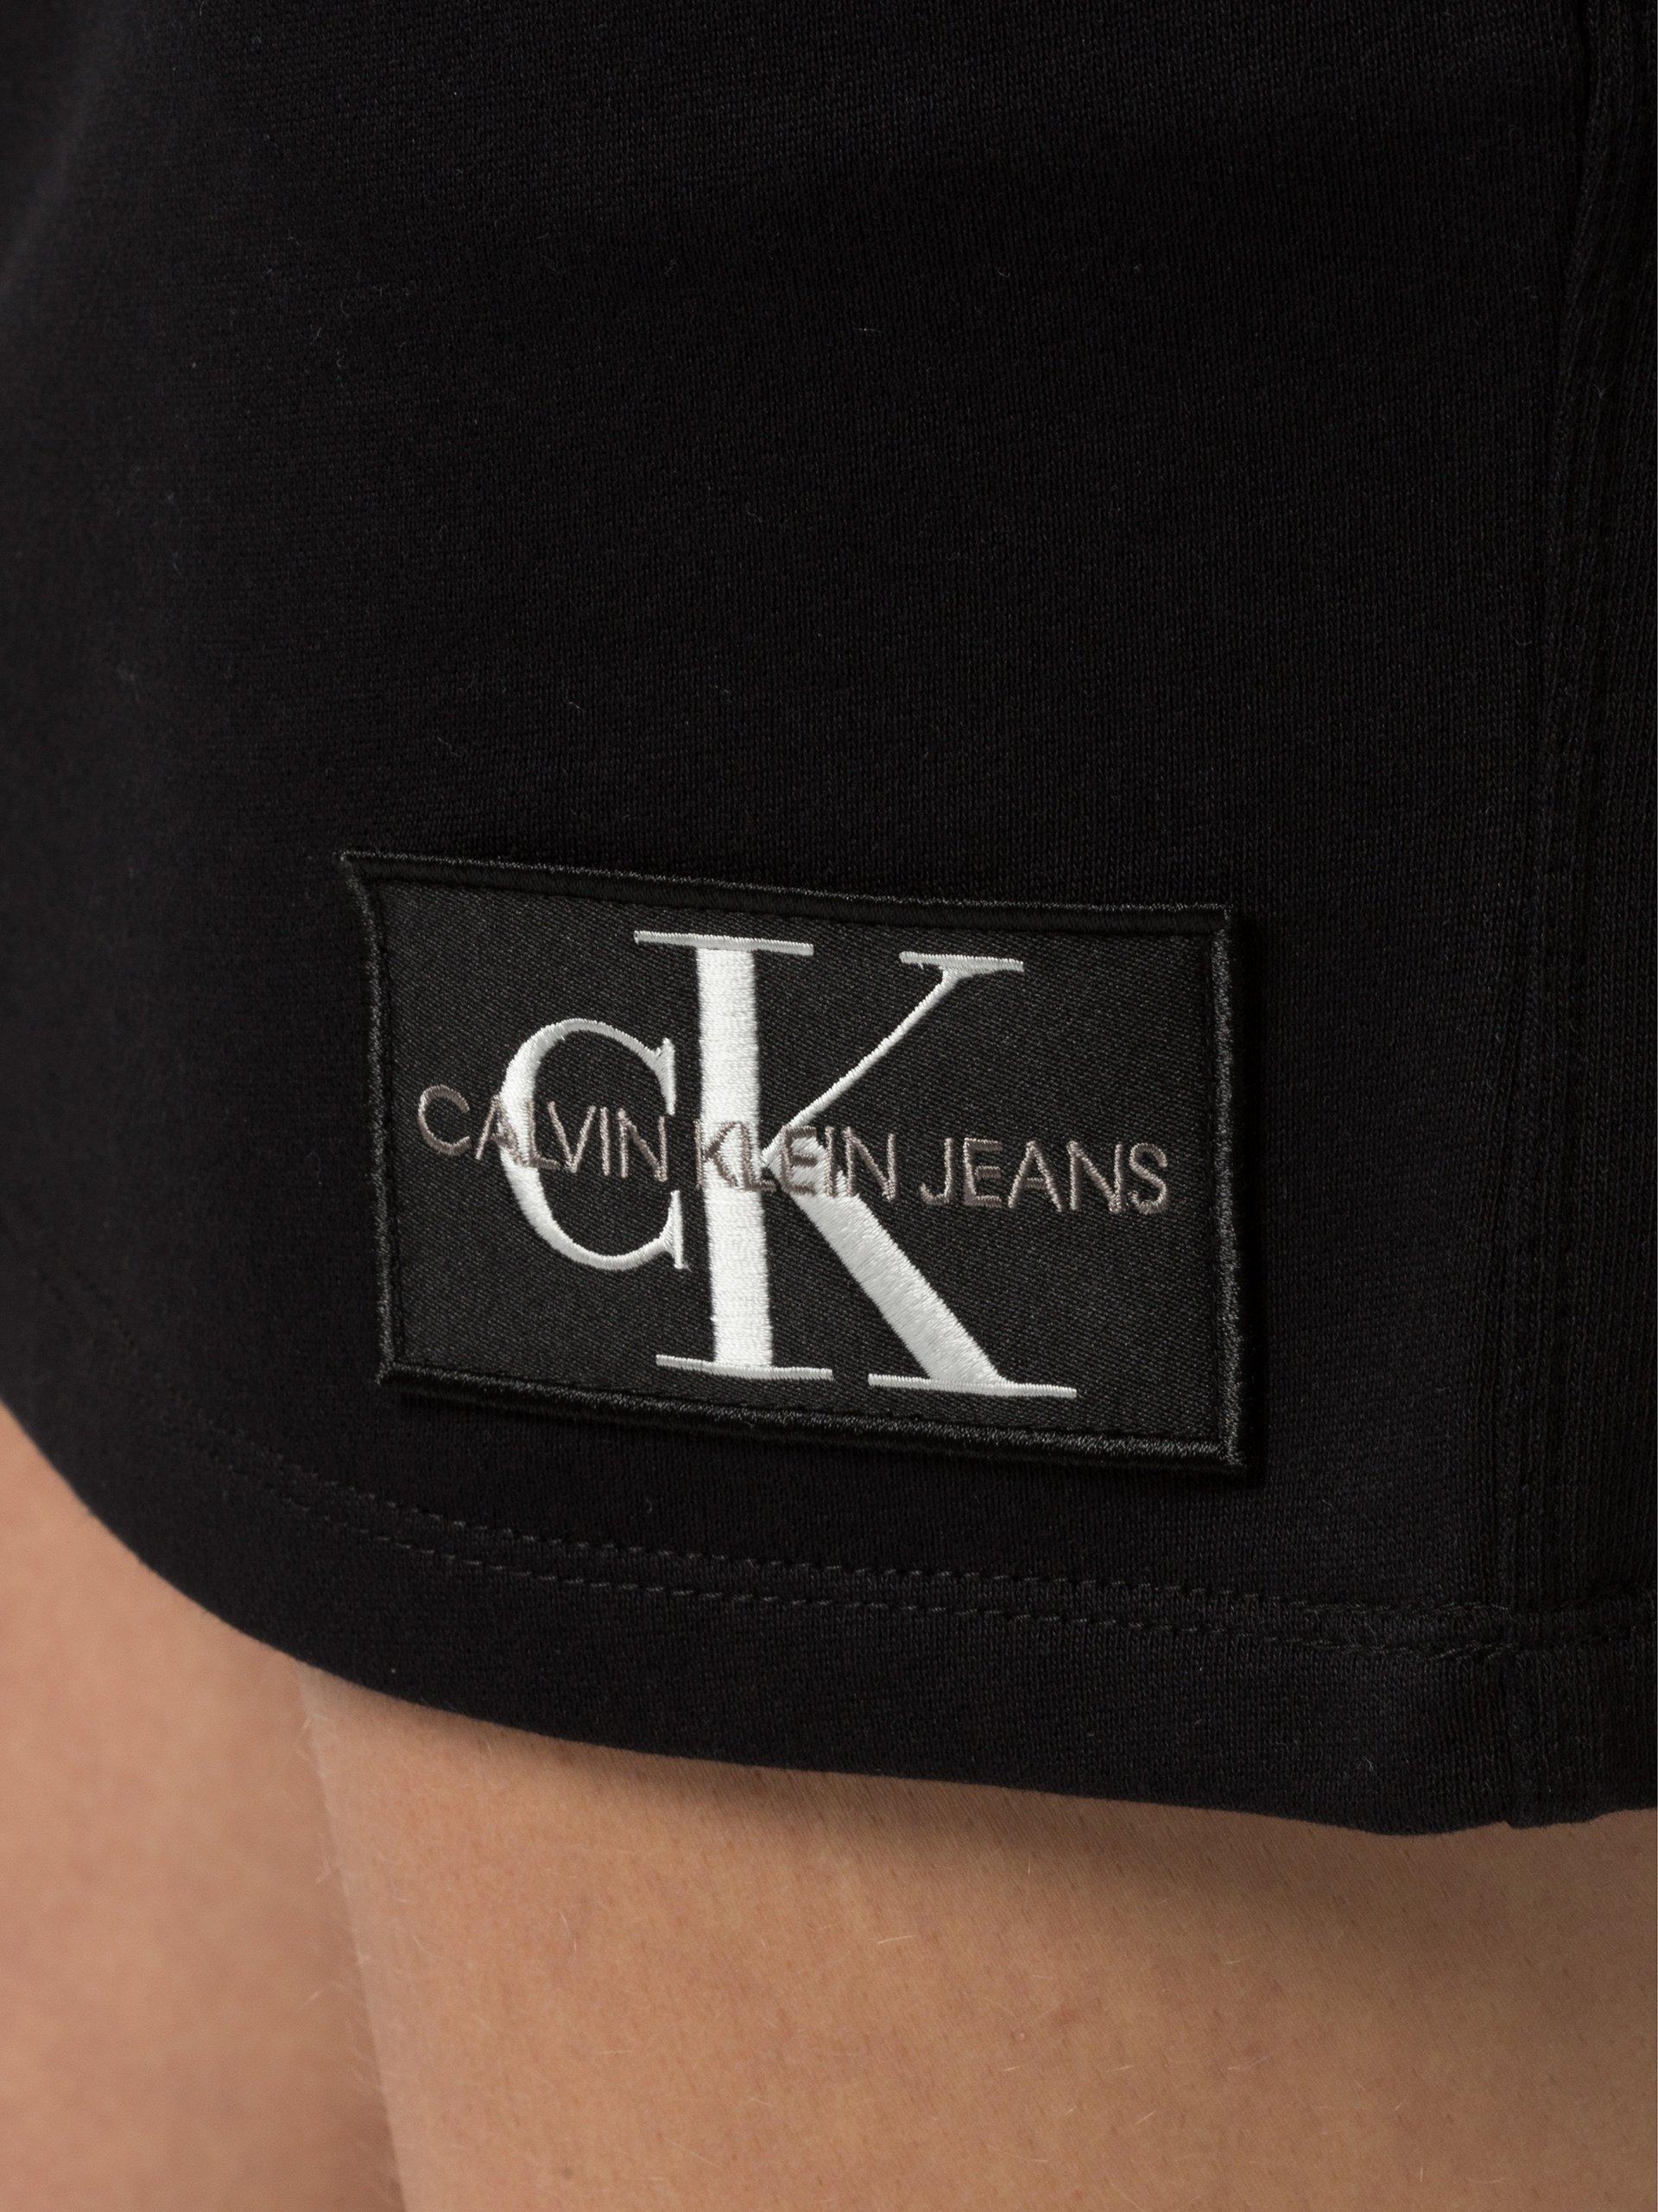 Calvin Klein Jeans Damen Rock